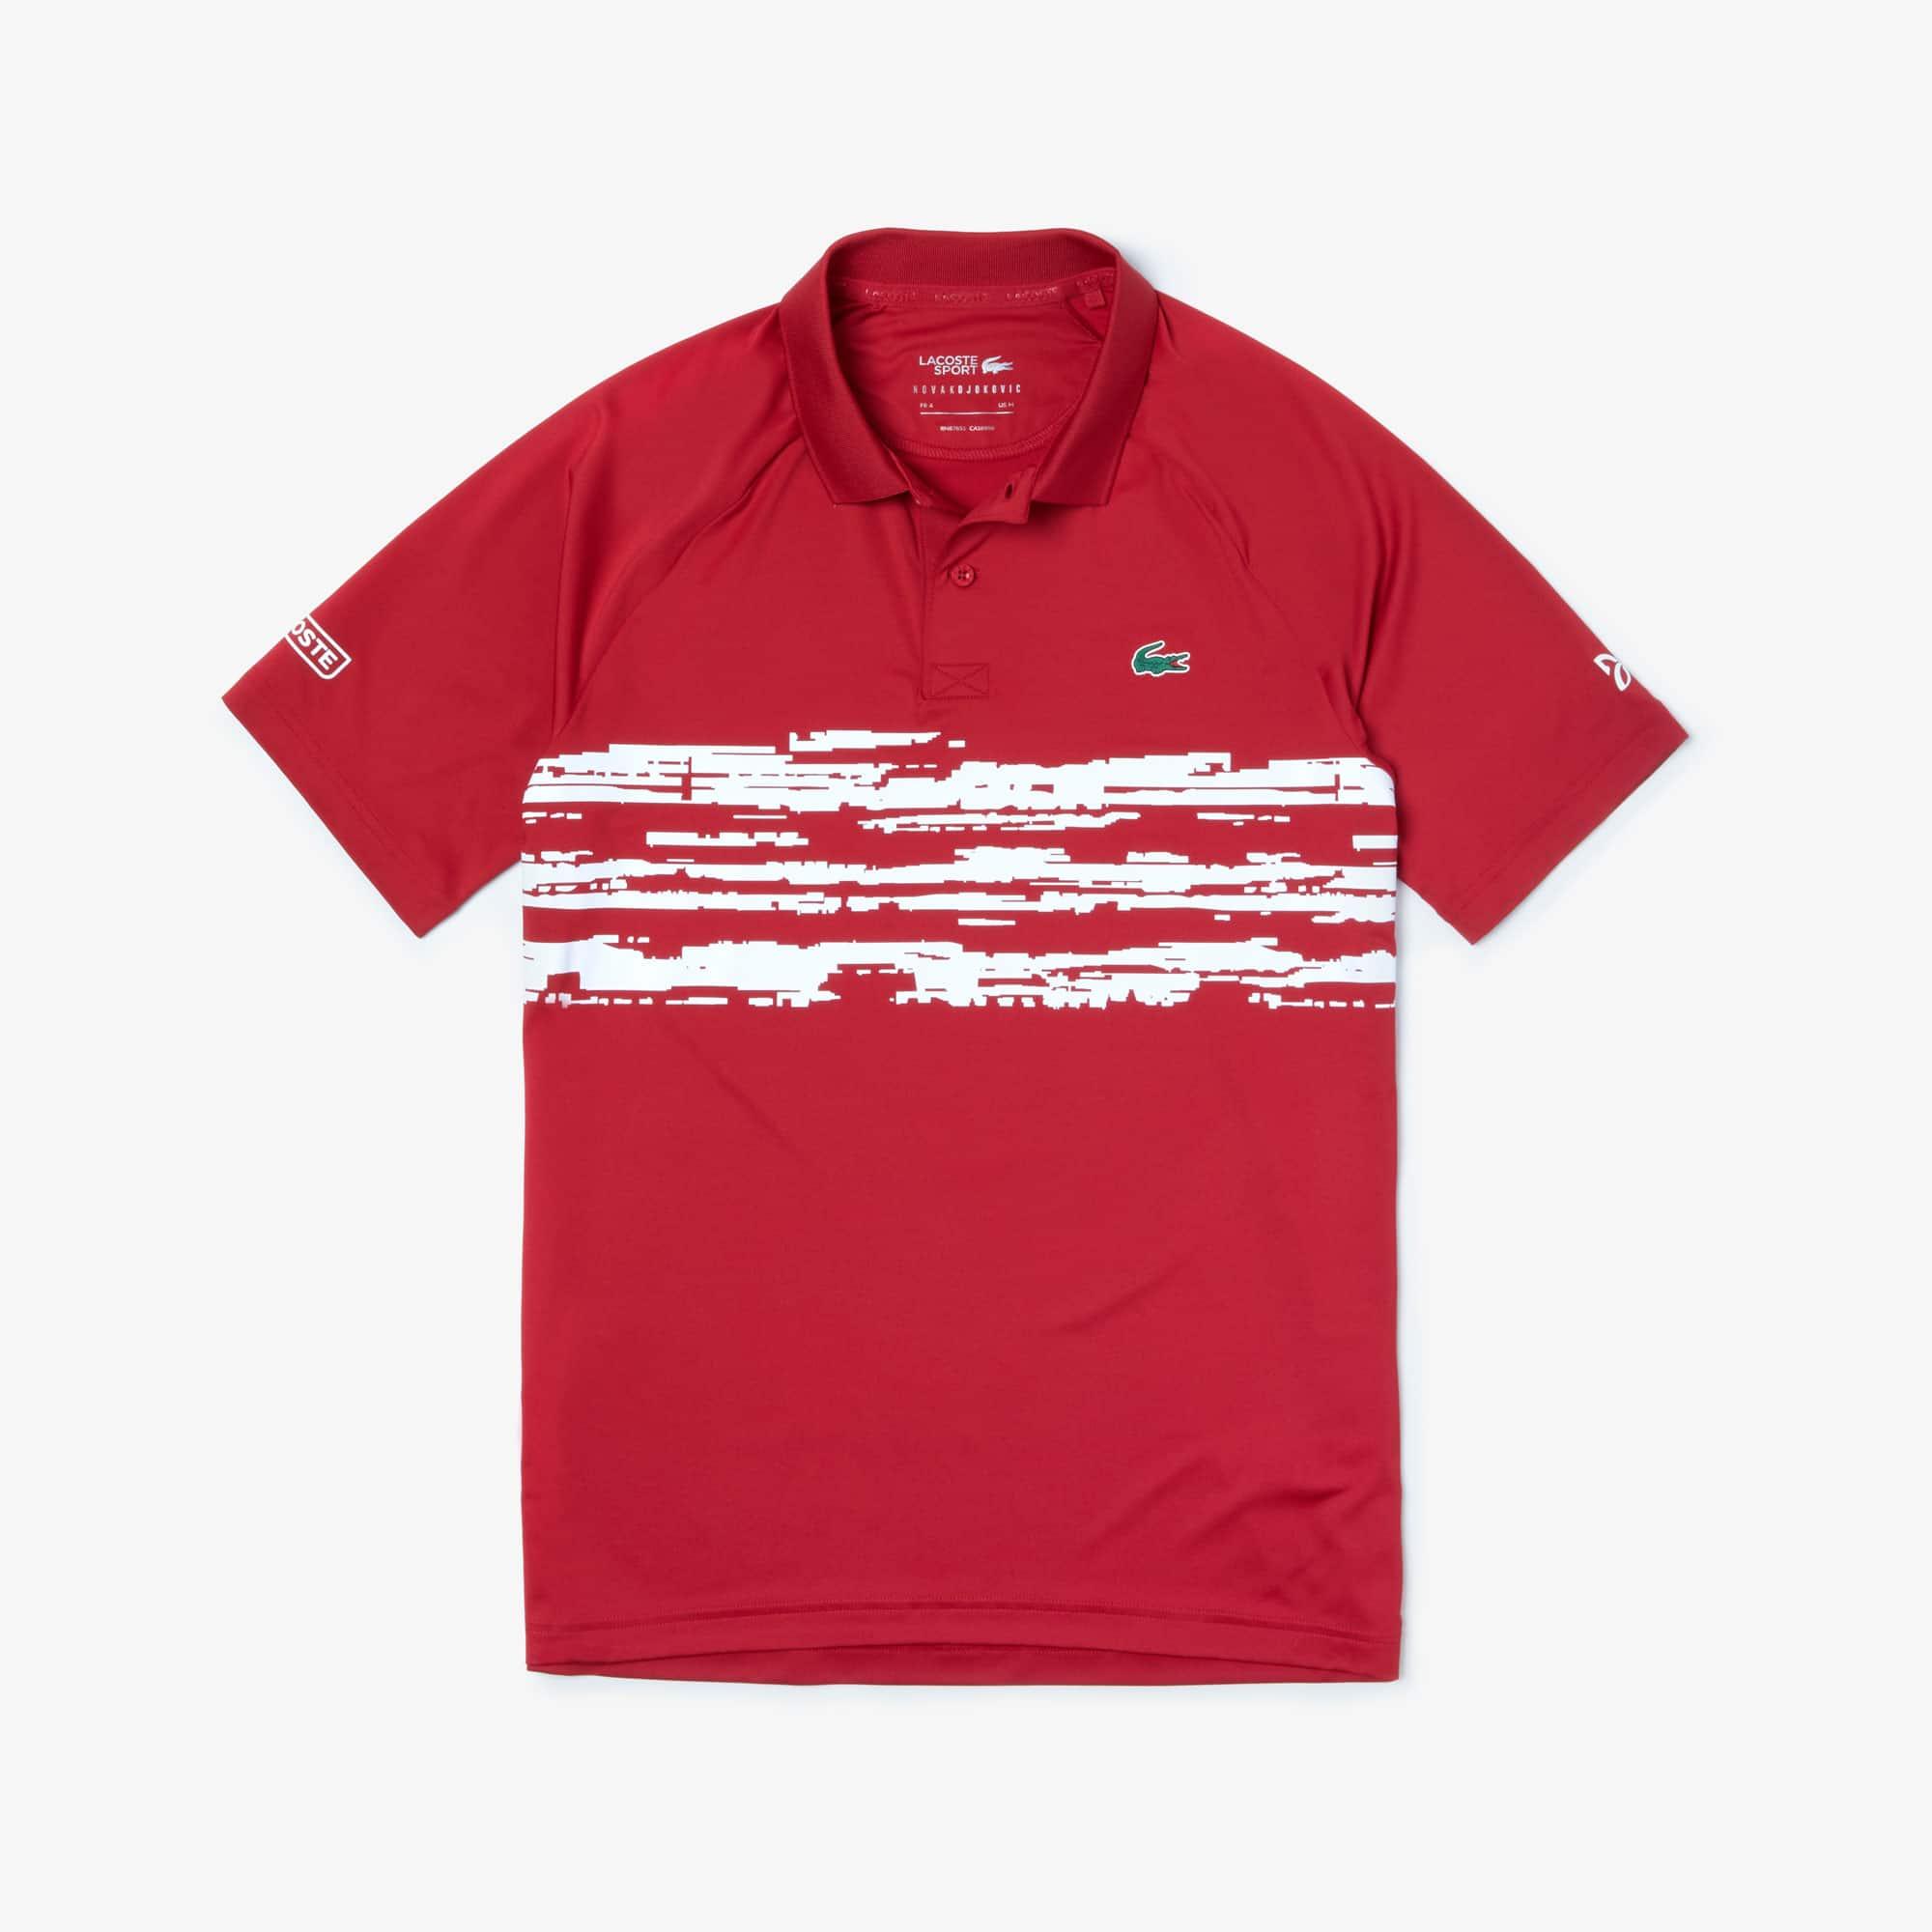 competitive price d4413 faed5 Herren LACOSTE SPORT x Novak Djokovic Jersey-Poloshirt mit Aufdruck